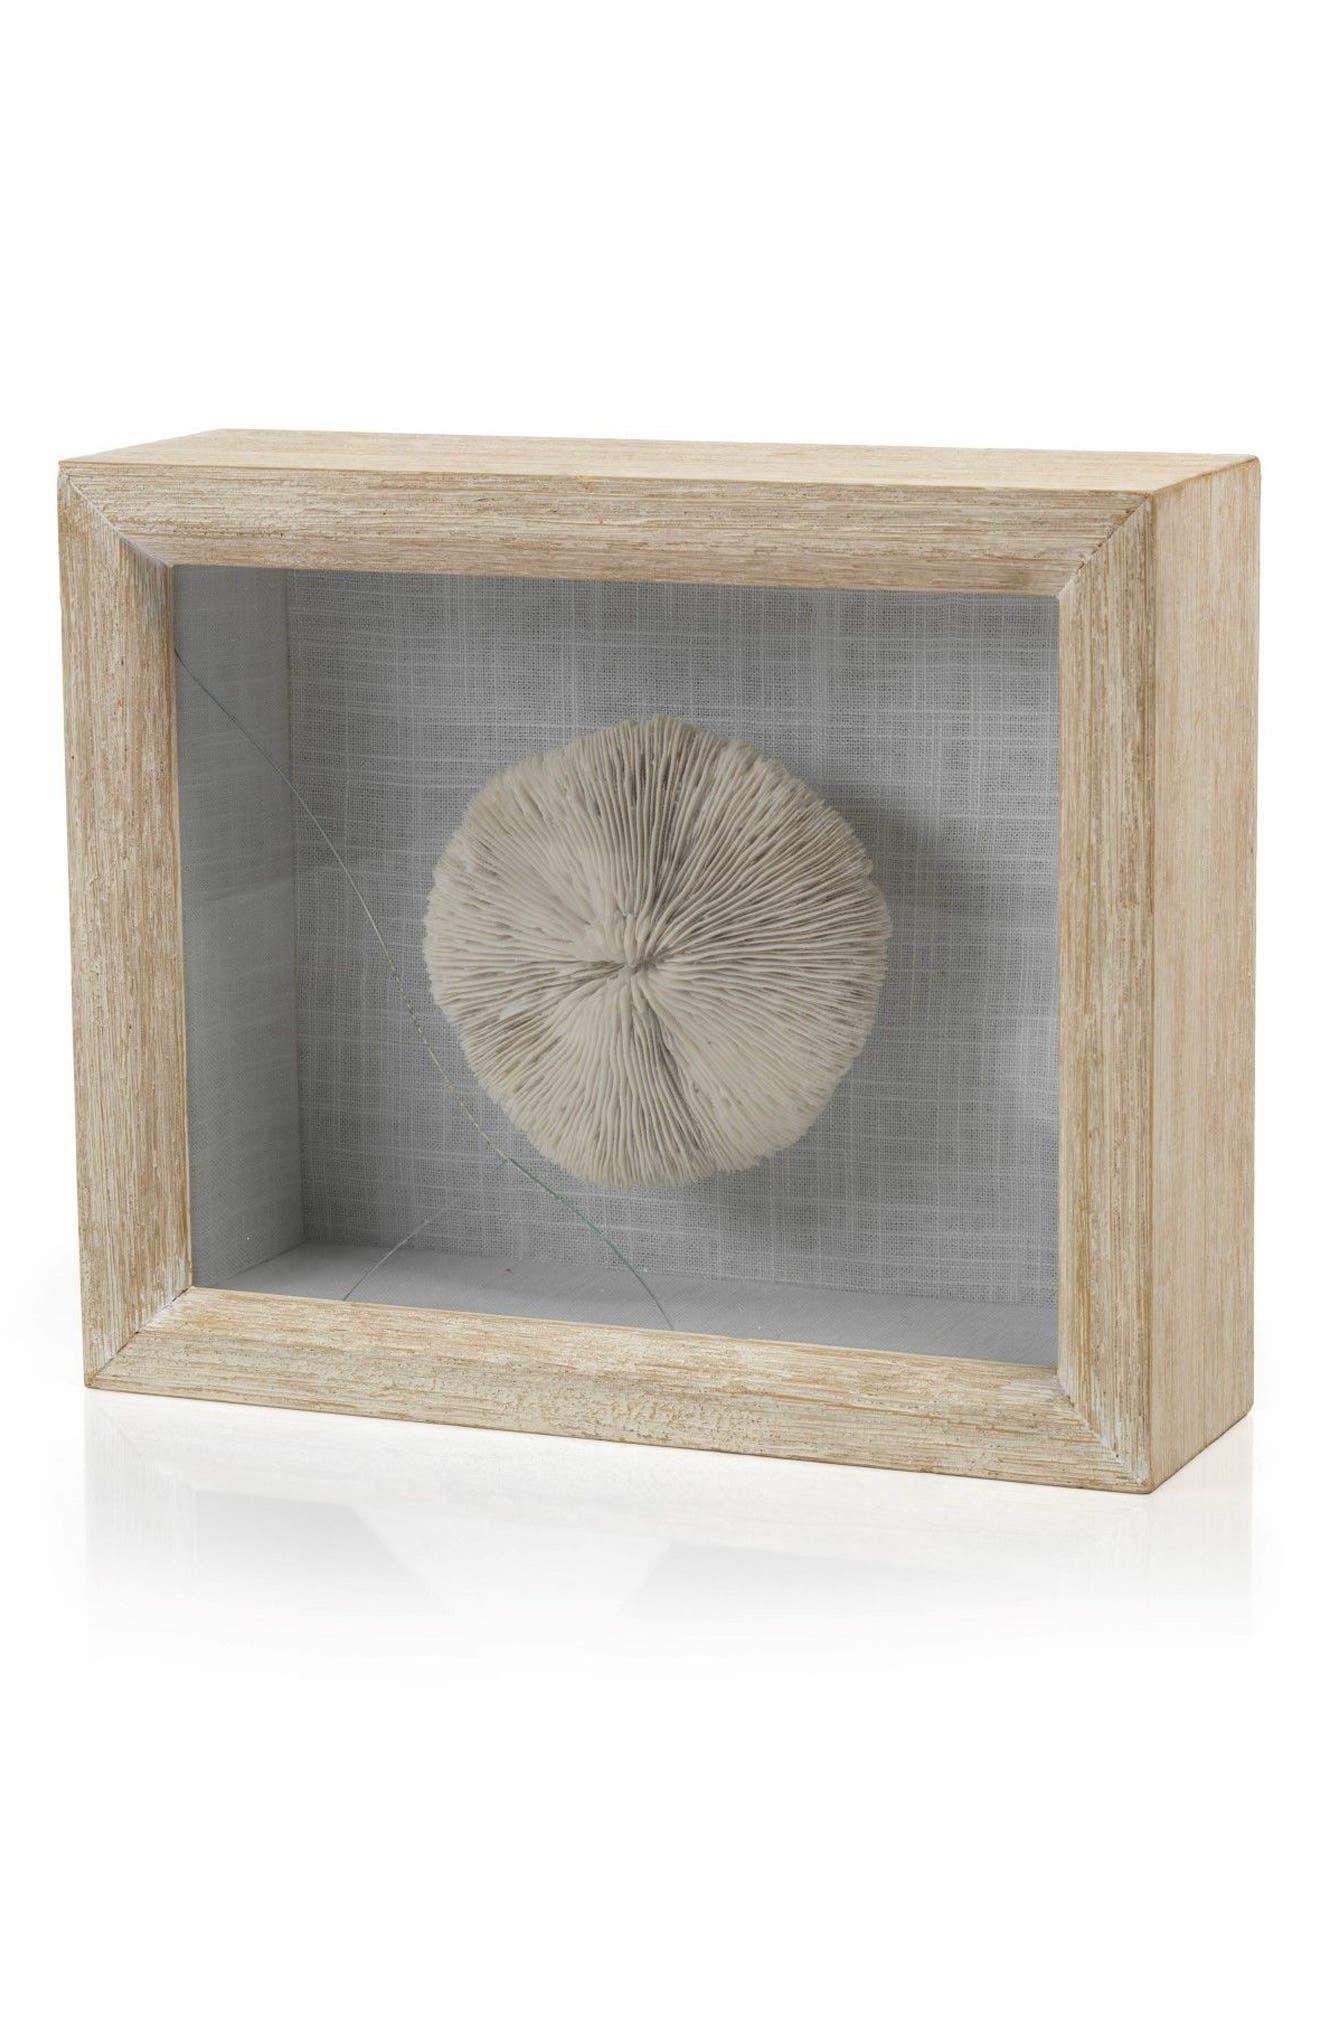 Mushroom Coral Shadow Box Art,                         Main,                         color, Off-White/ Blue/ Beige